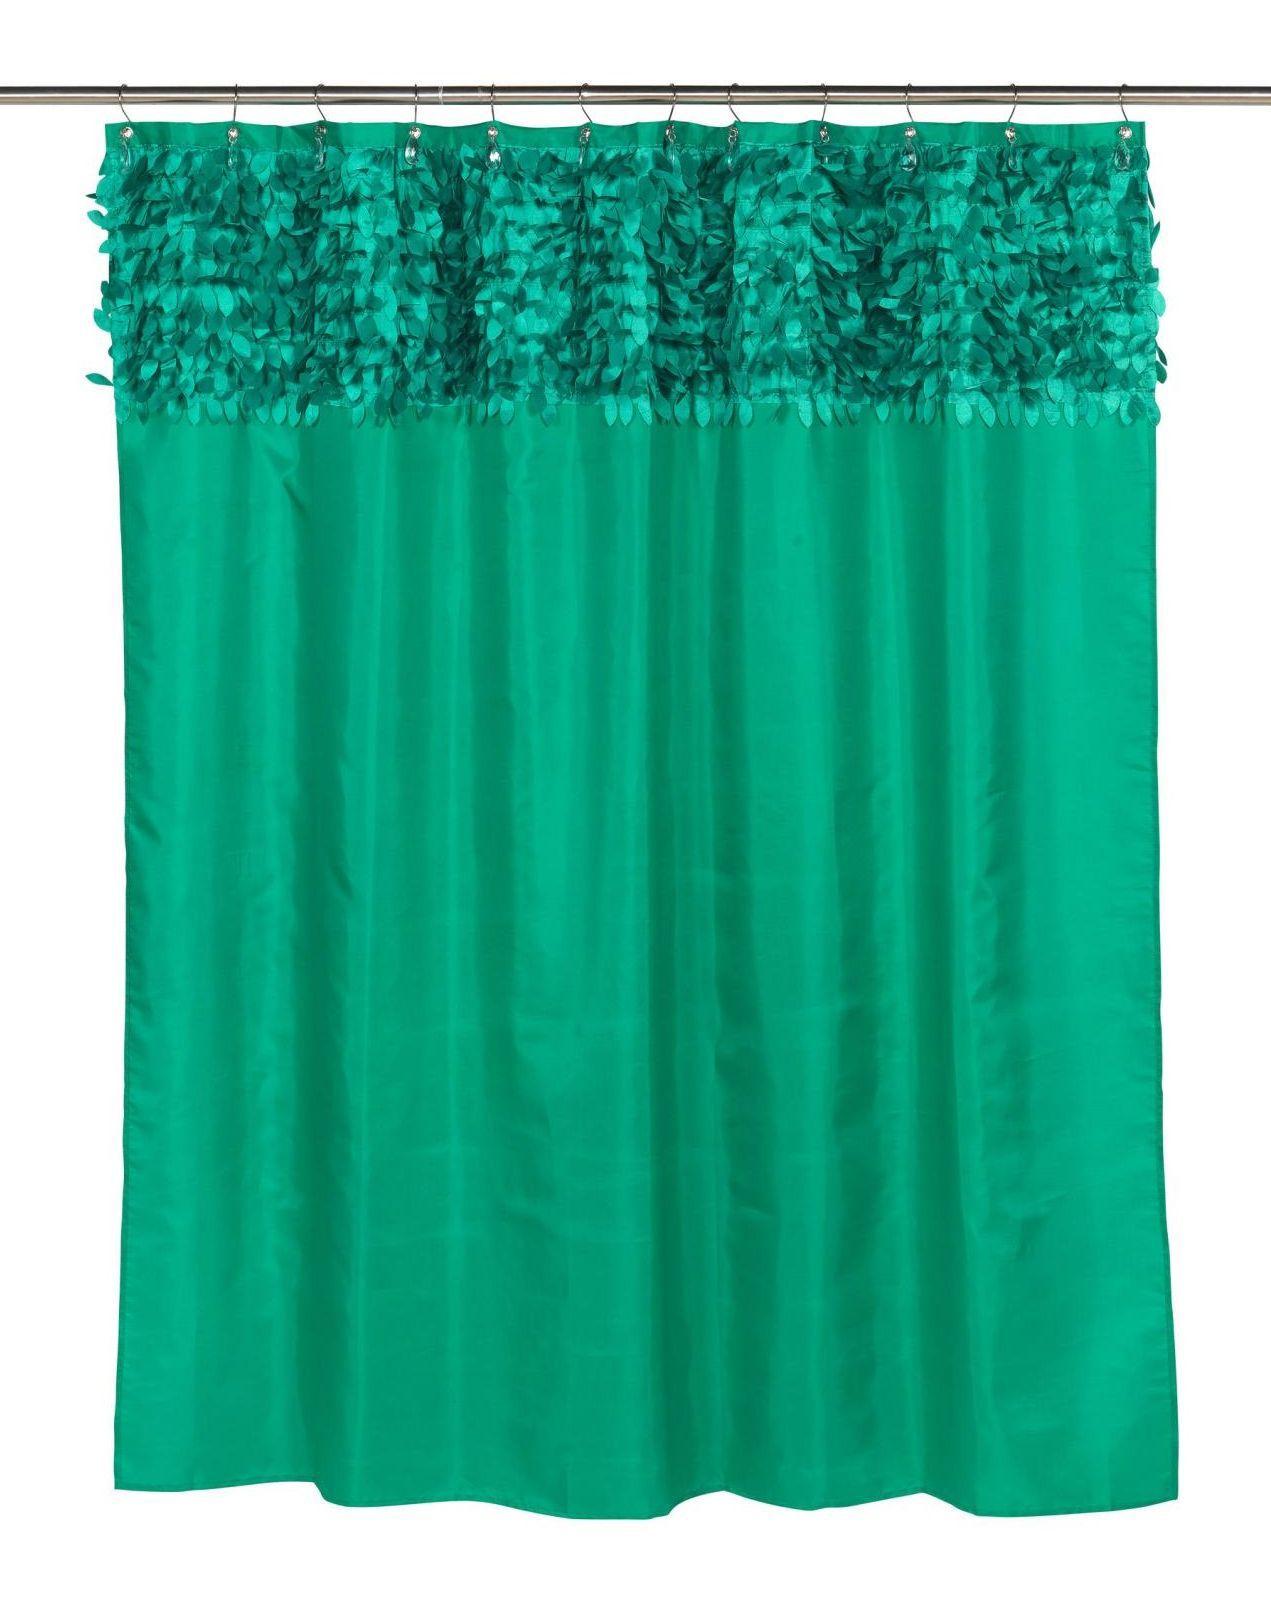 Шторки Шторка для ванной 178x183 Carnation Home Fashions Jasmine Emerald elitnaya-shtorka-dlya-vannoy-jasmine-emerald-ot-carnation-home-fashions-ssha-kitay.jpg